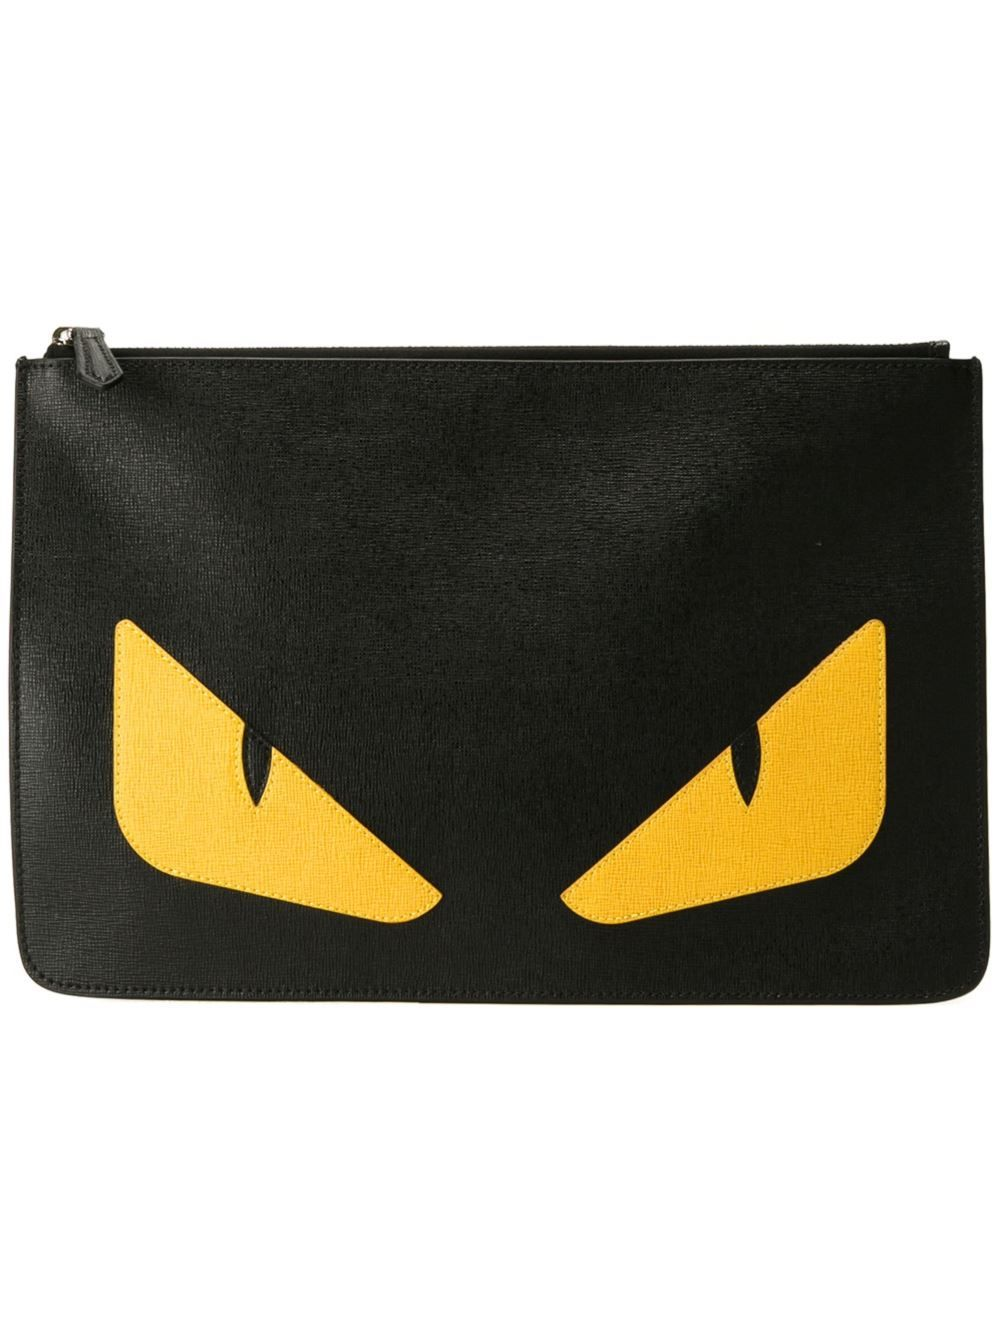 1a60e007ad6f fendi  bagbugs  clutch  bag  men  fashion  new 3style www.jofre.eu ...